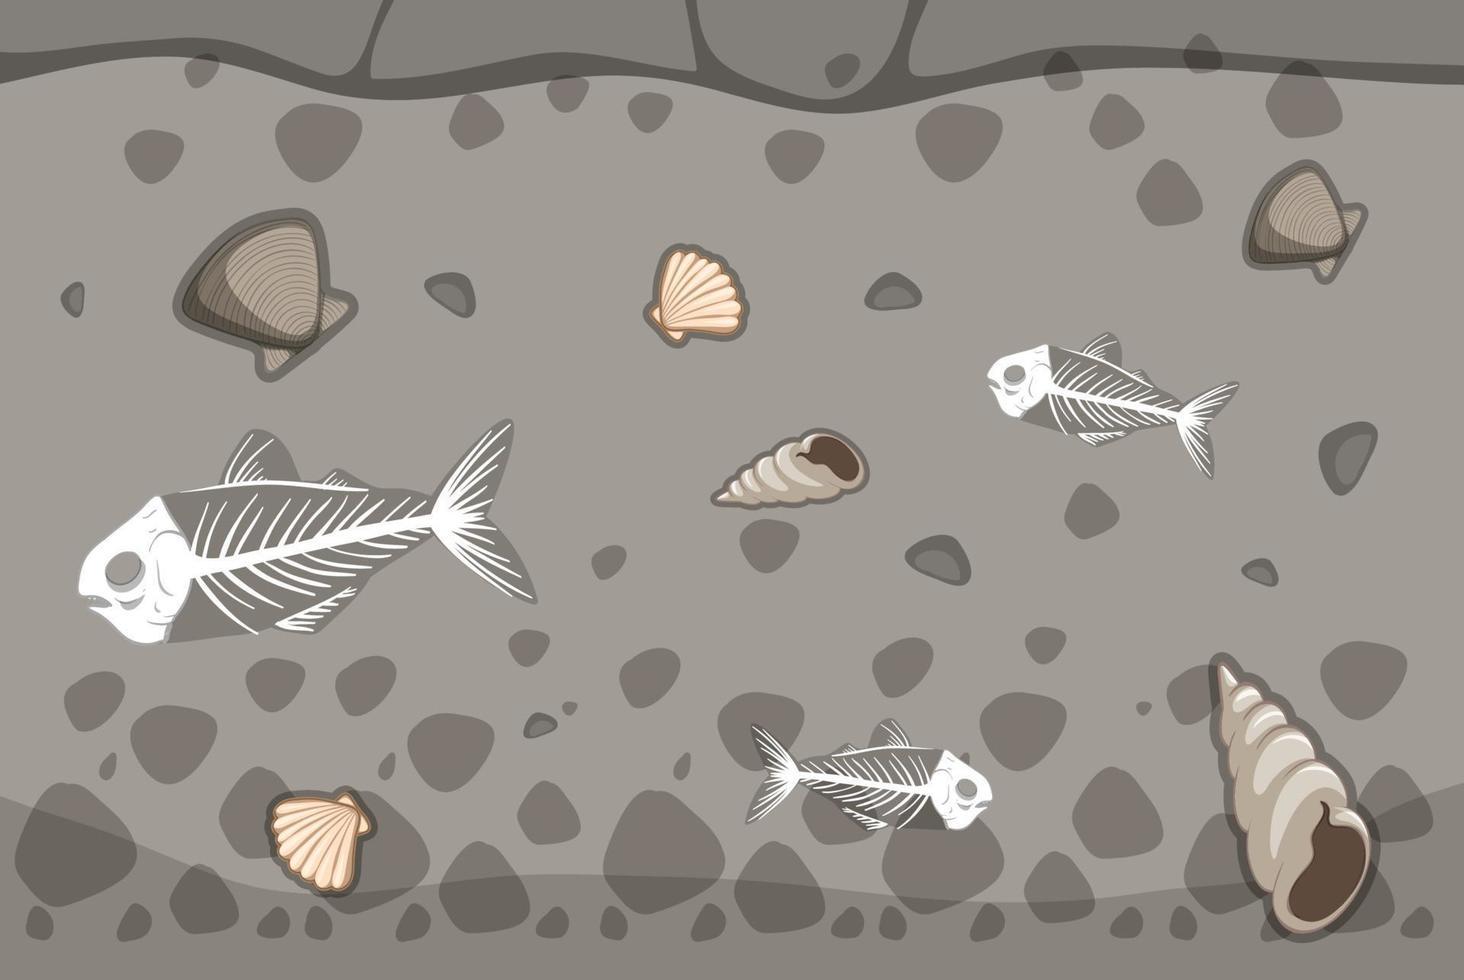 solo subterrâneo com fósseis de espinha de peixe e conchas vetor